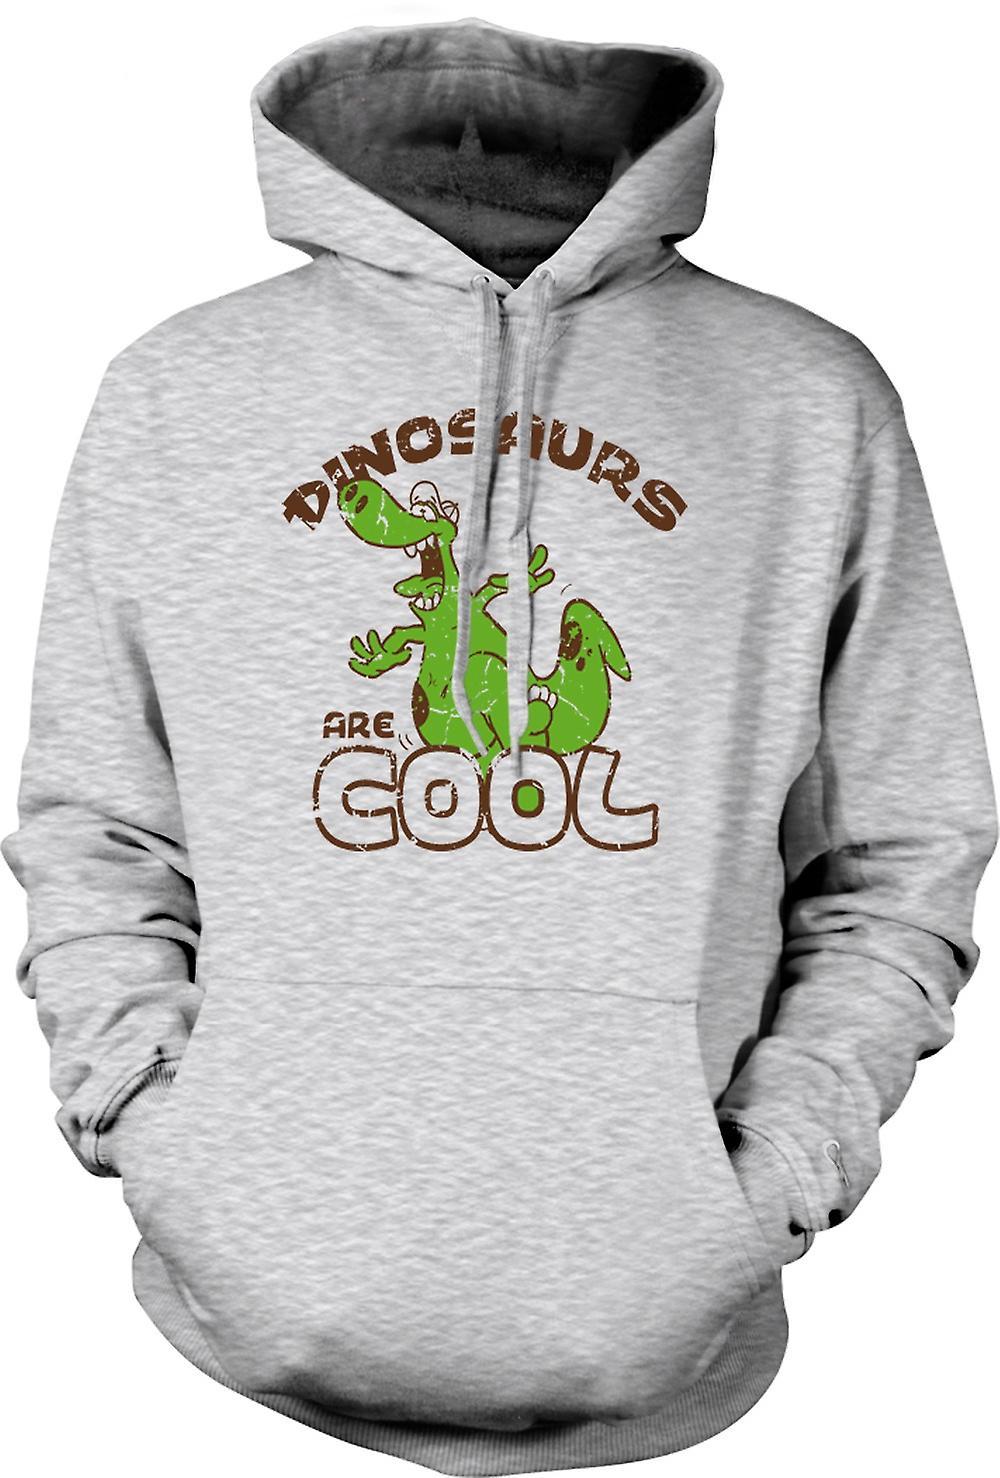 womens hoodie dinosaurier sind cool lustig fruugo. Black Bedroom Furniture Sets. Home Design Ideas